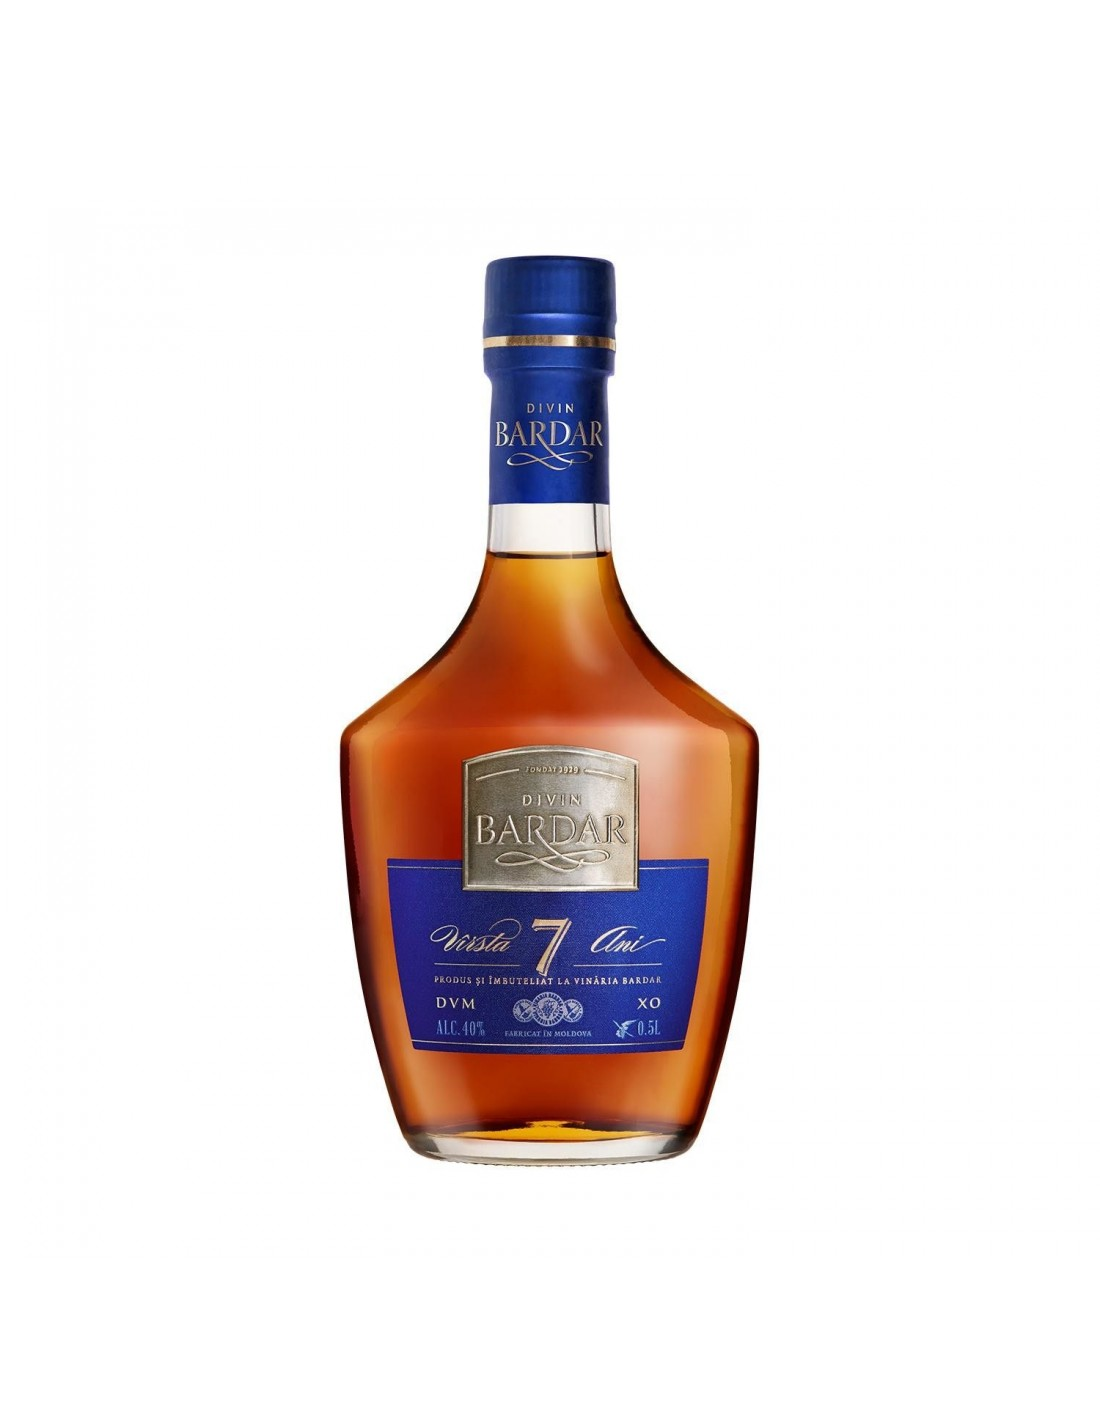 Coniac Brandy Divin Barbar 40% alc., 0.5L, 7 ani